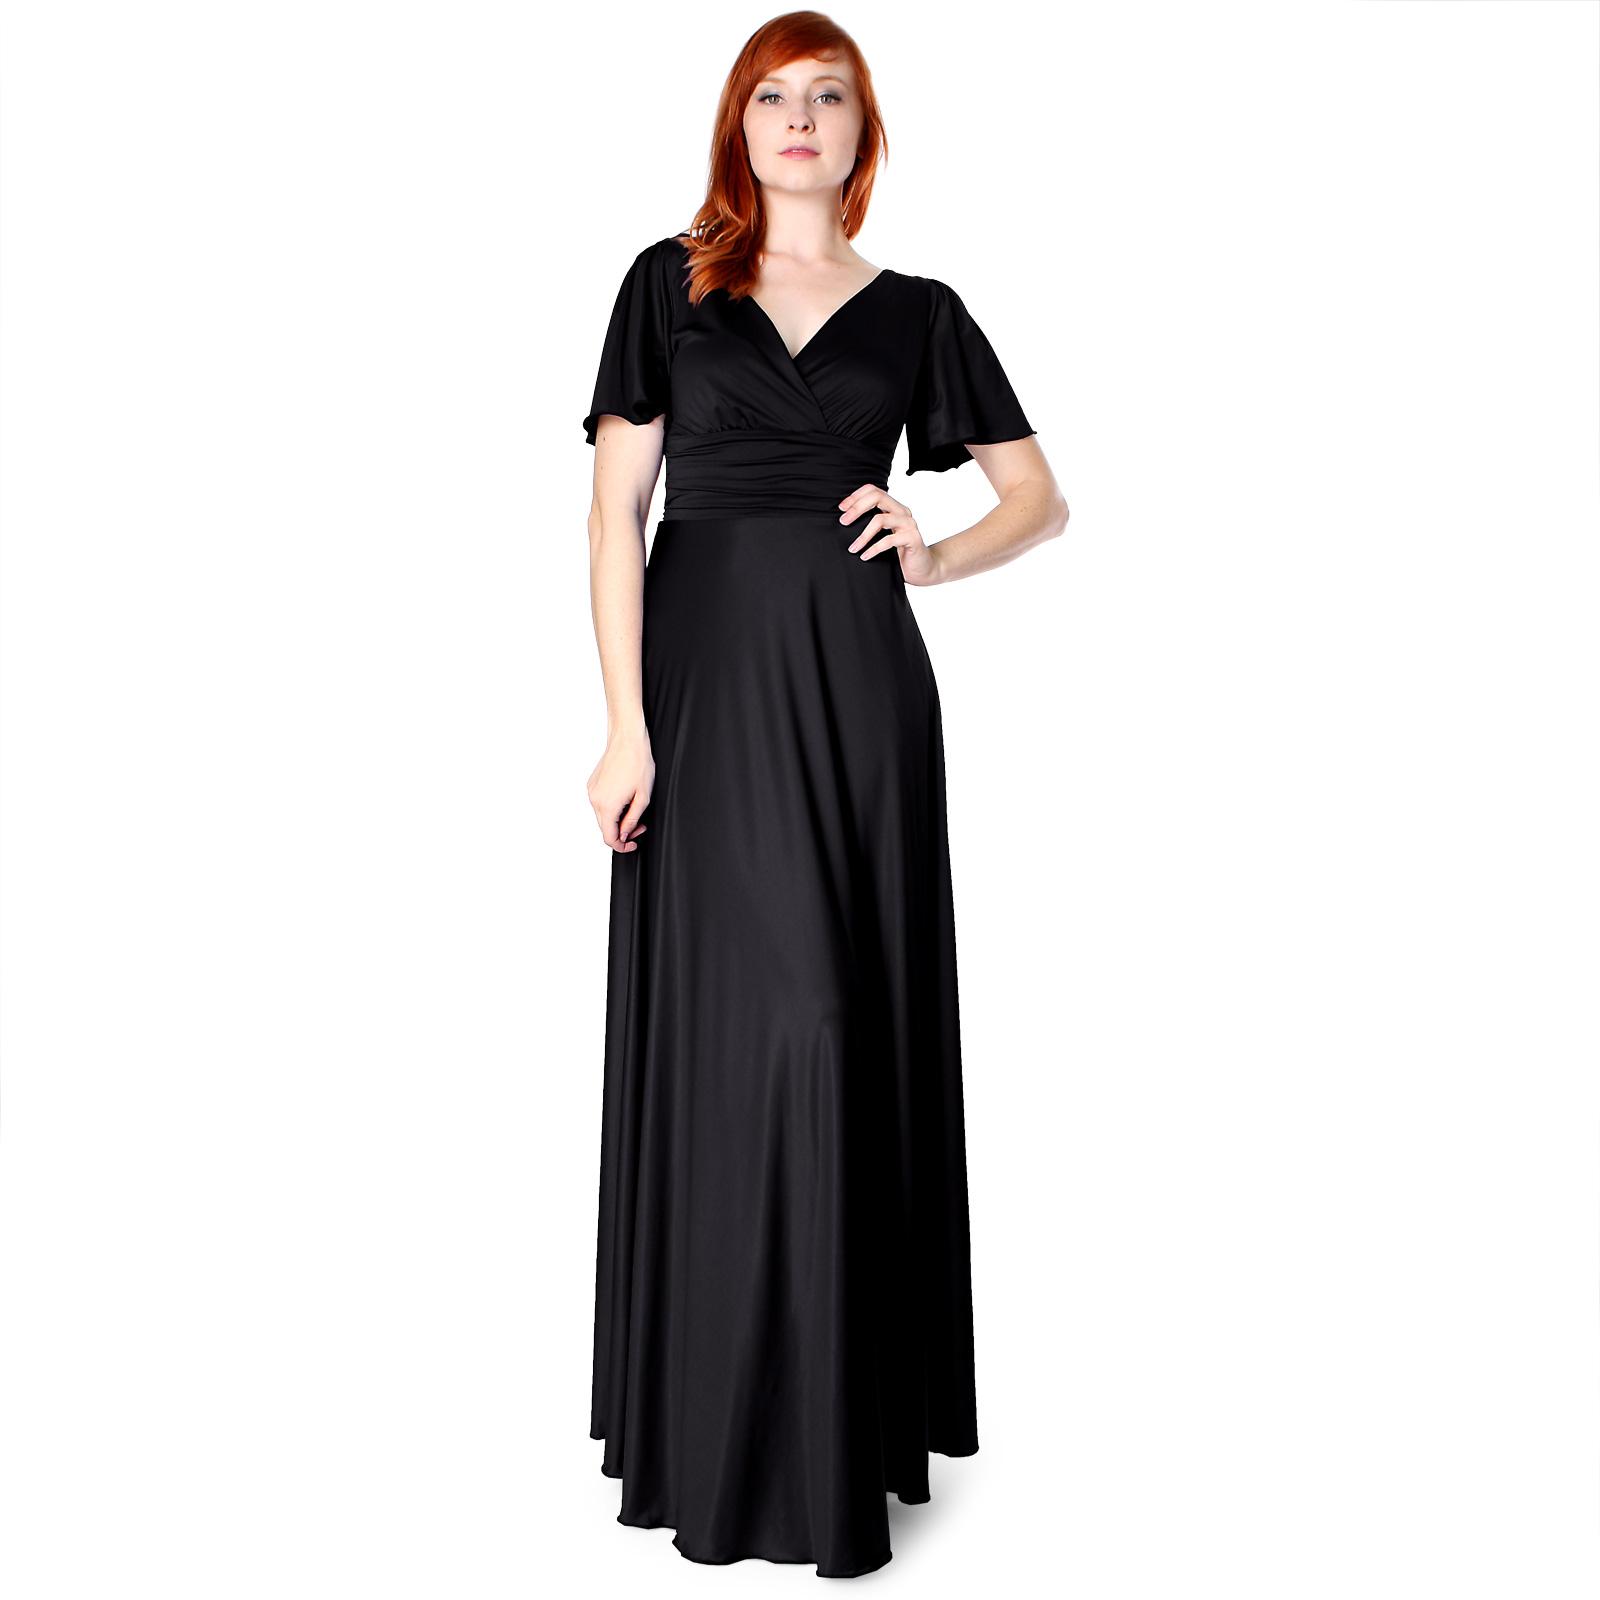 Evanese Women's Shiny Venezian Long Evening Dress with Sleeves at Sears.com